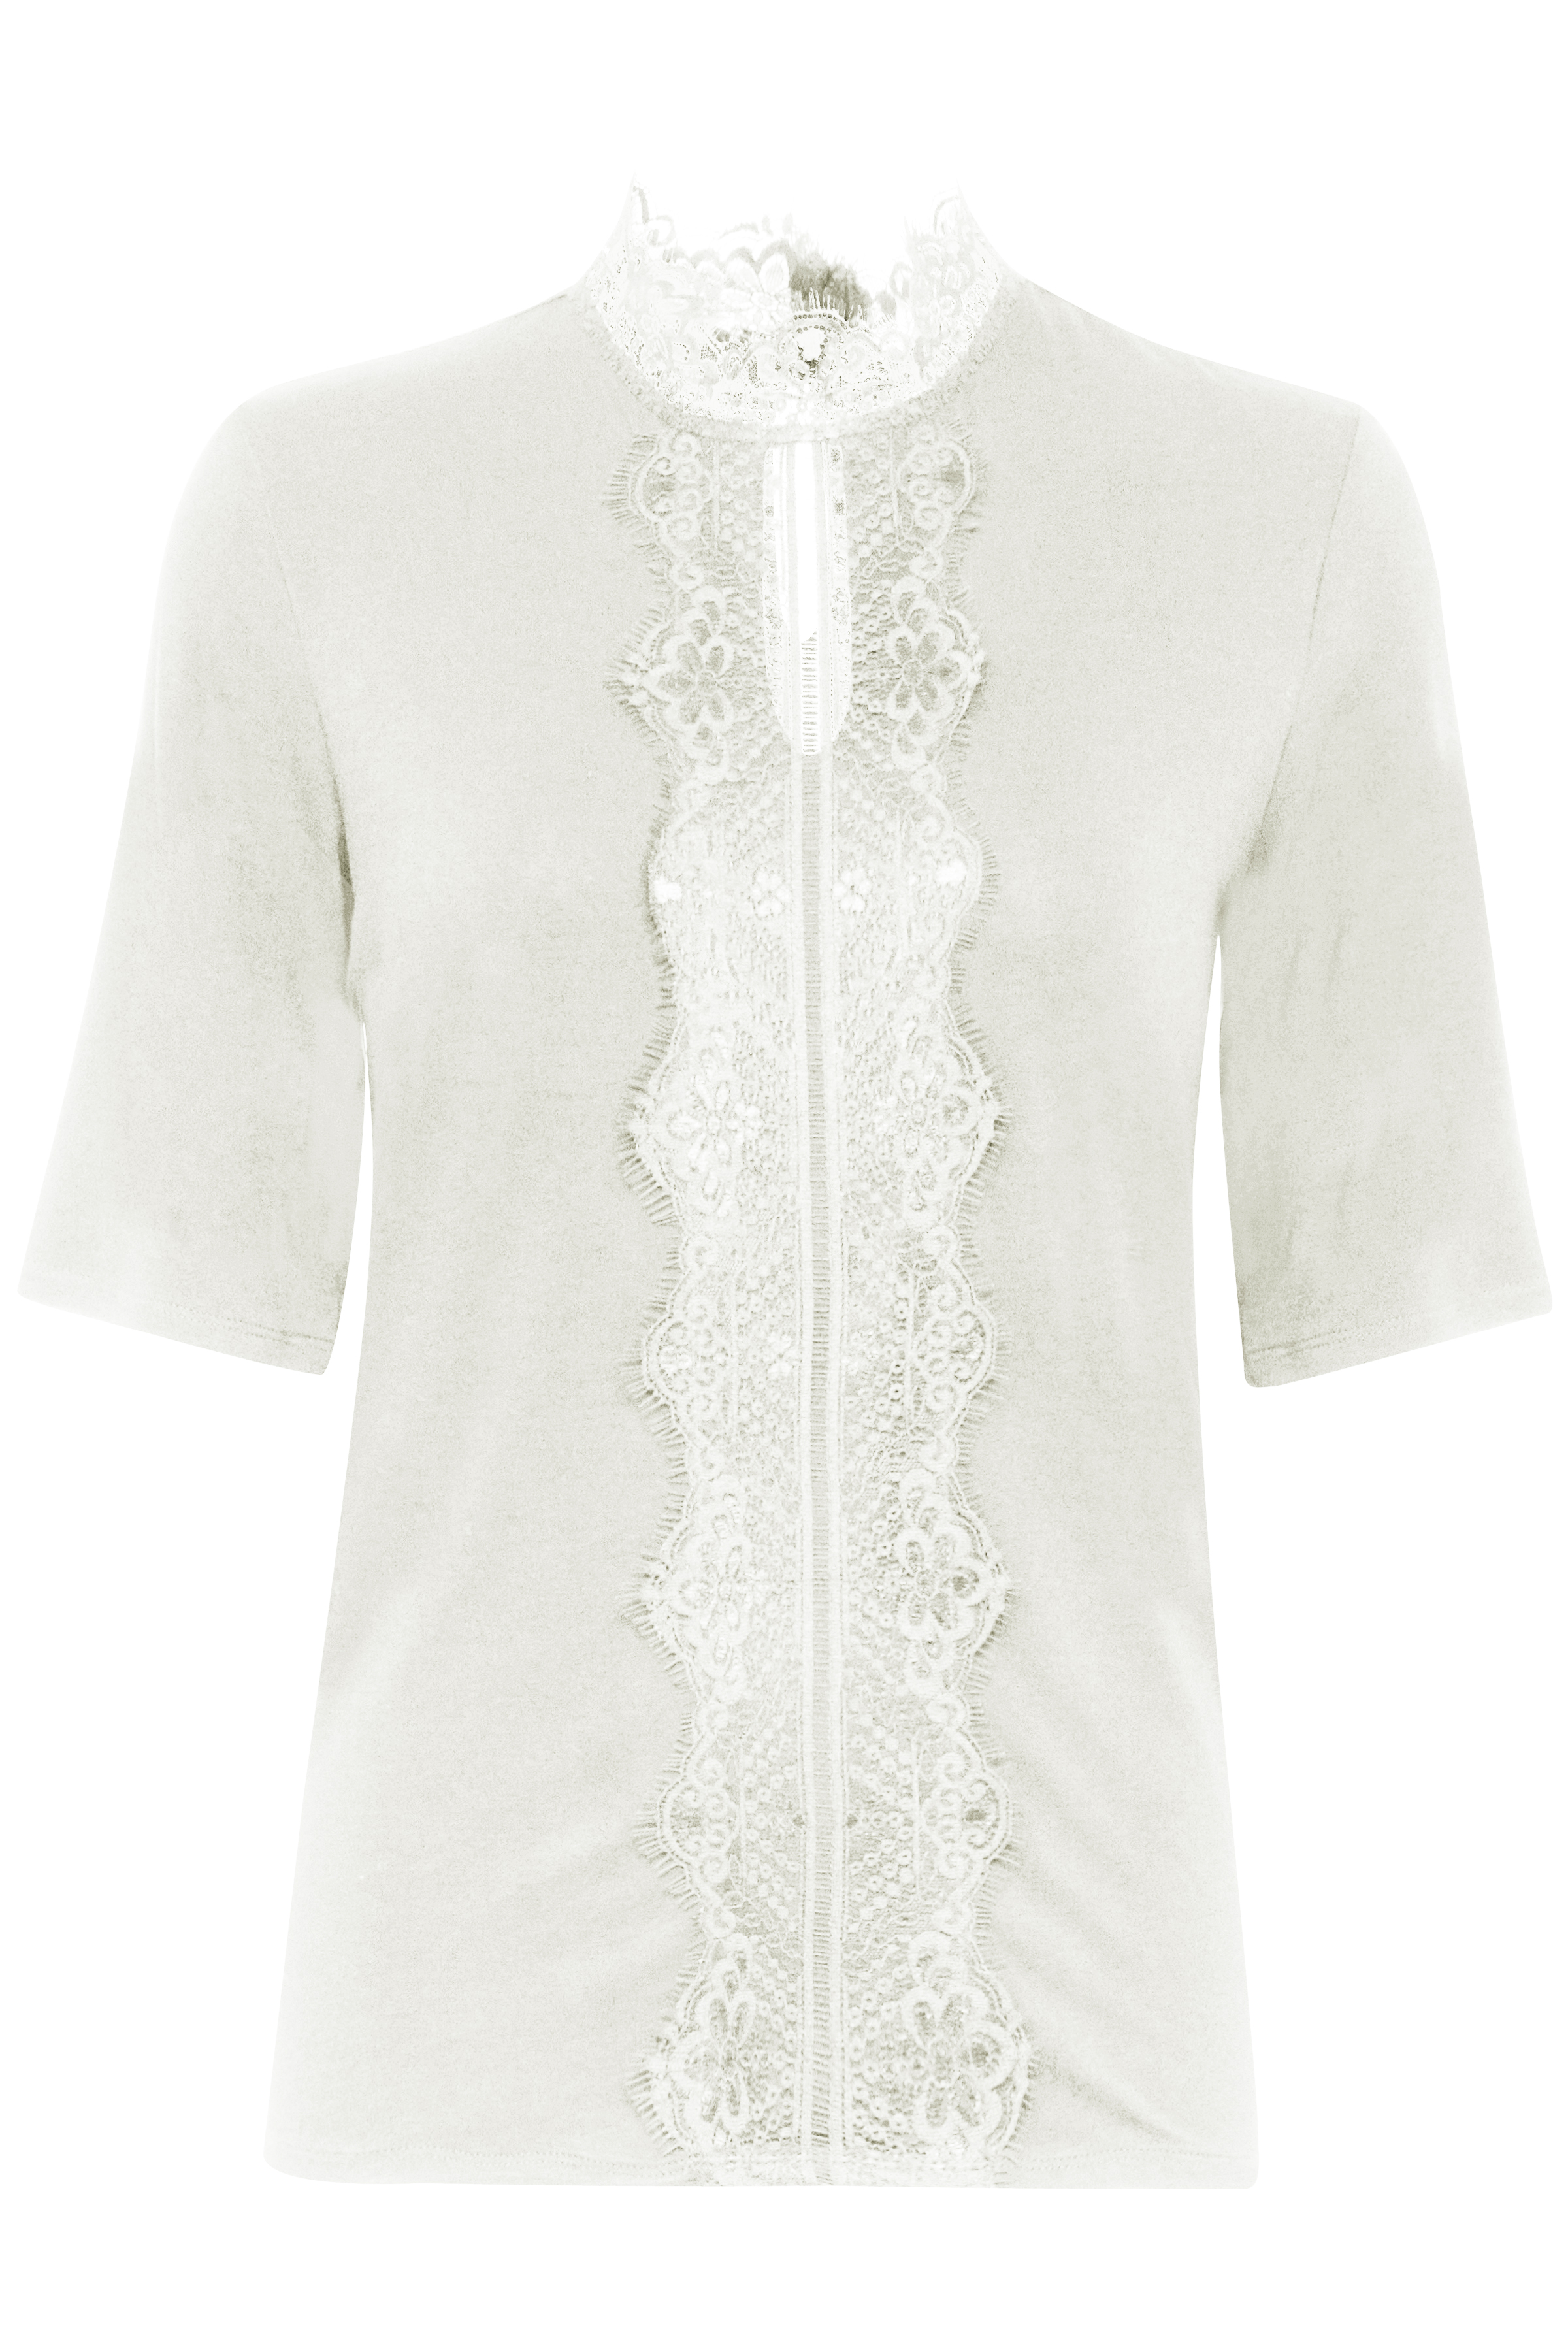 Soft Cream Kortærmet bluse – Køb Soft Cream Kortærmet bluse fra str. XS-XXL her